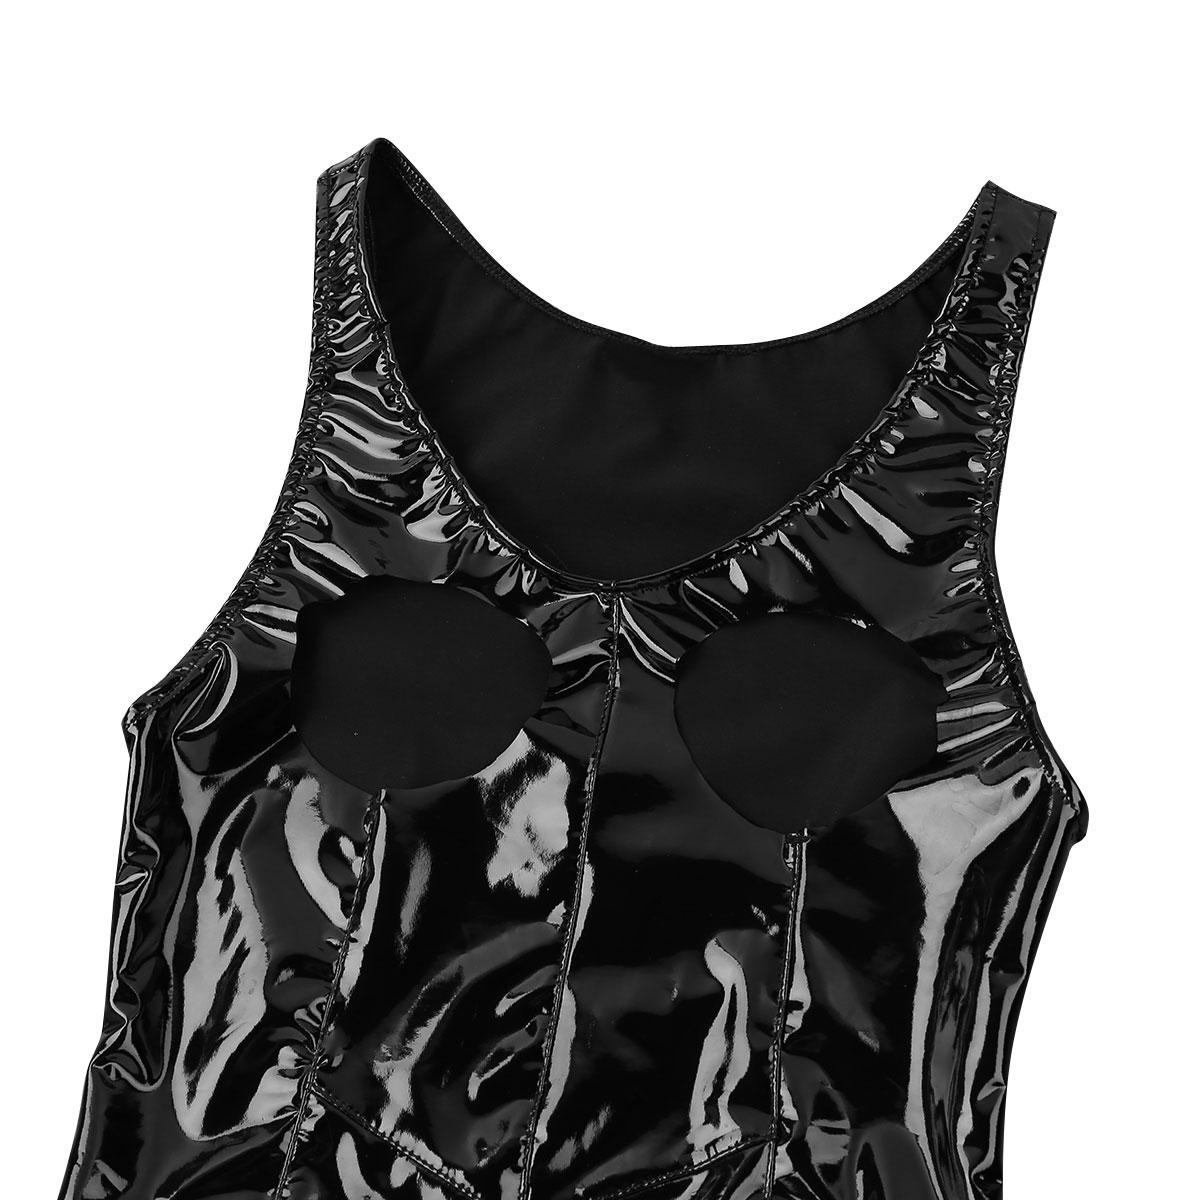 Womens Lingerie Sexy Bodysuit Open Crotch Zipper Bodystocking Sissy Bust Latex See-through Babydoll High Cut Teddy Body Suit 3